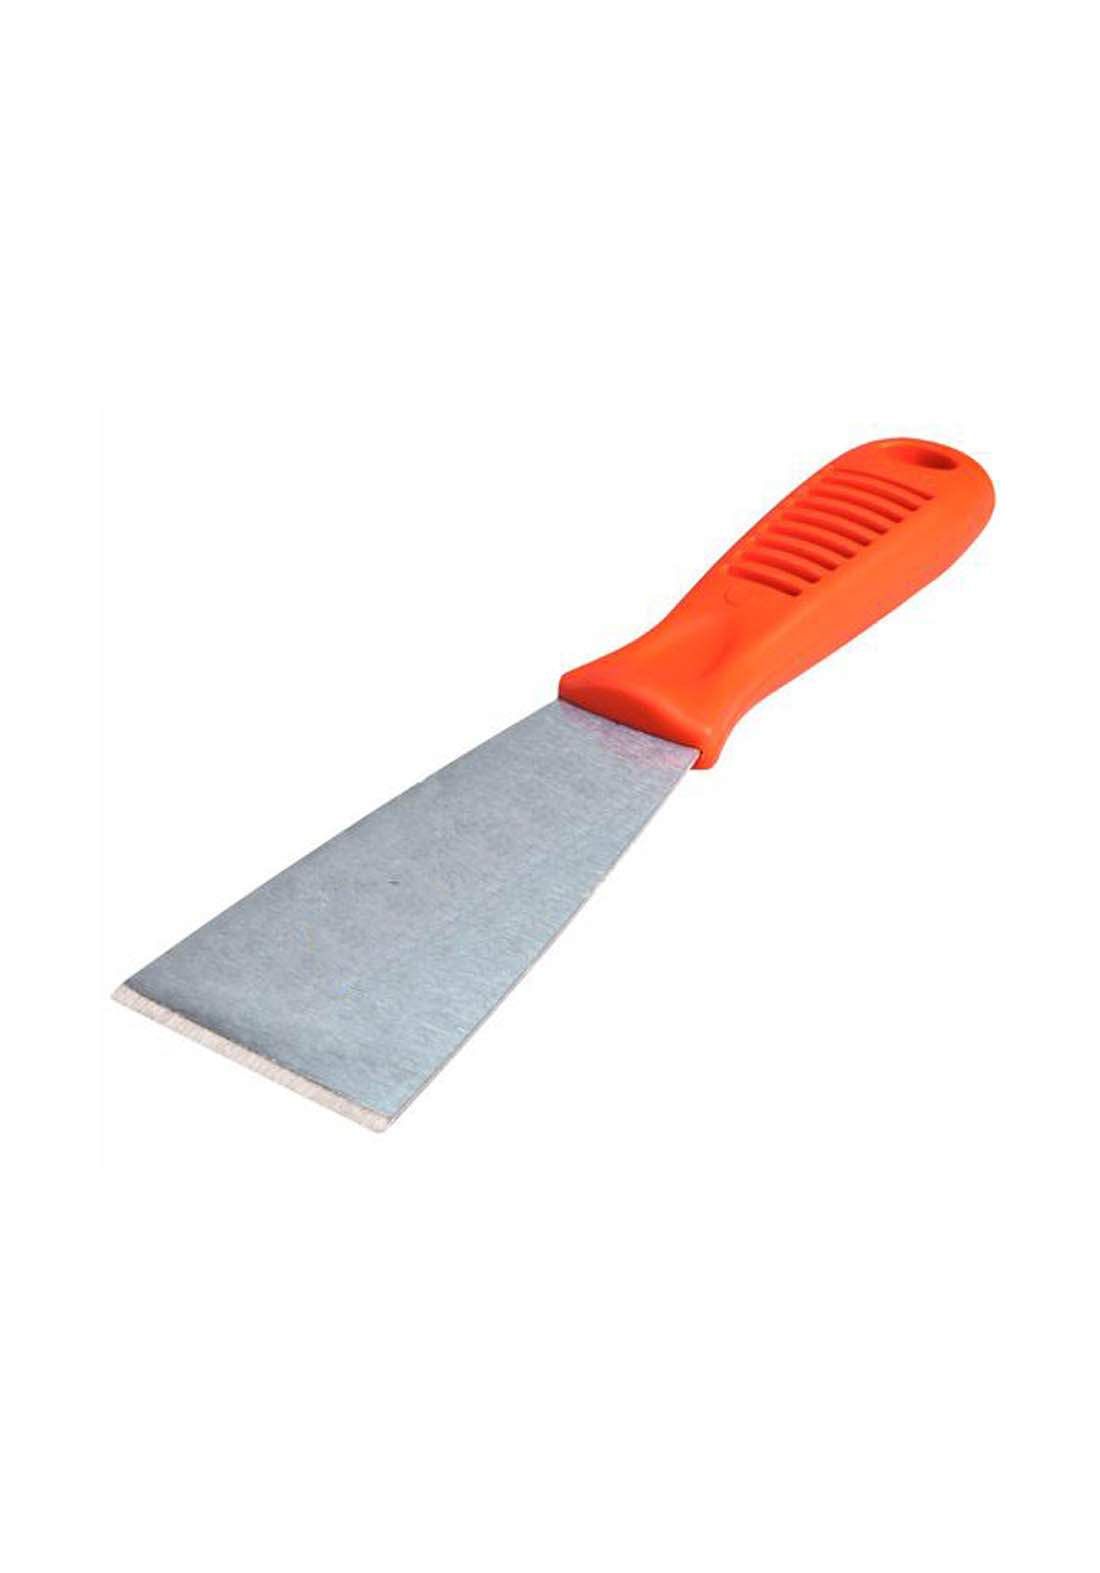 Tramontina77395/045 Steel spatula 4Cm w / plastic handle شفرة تربة 4 سم